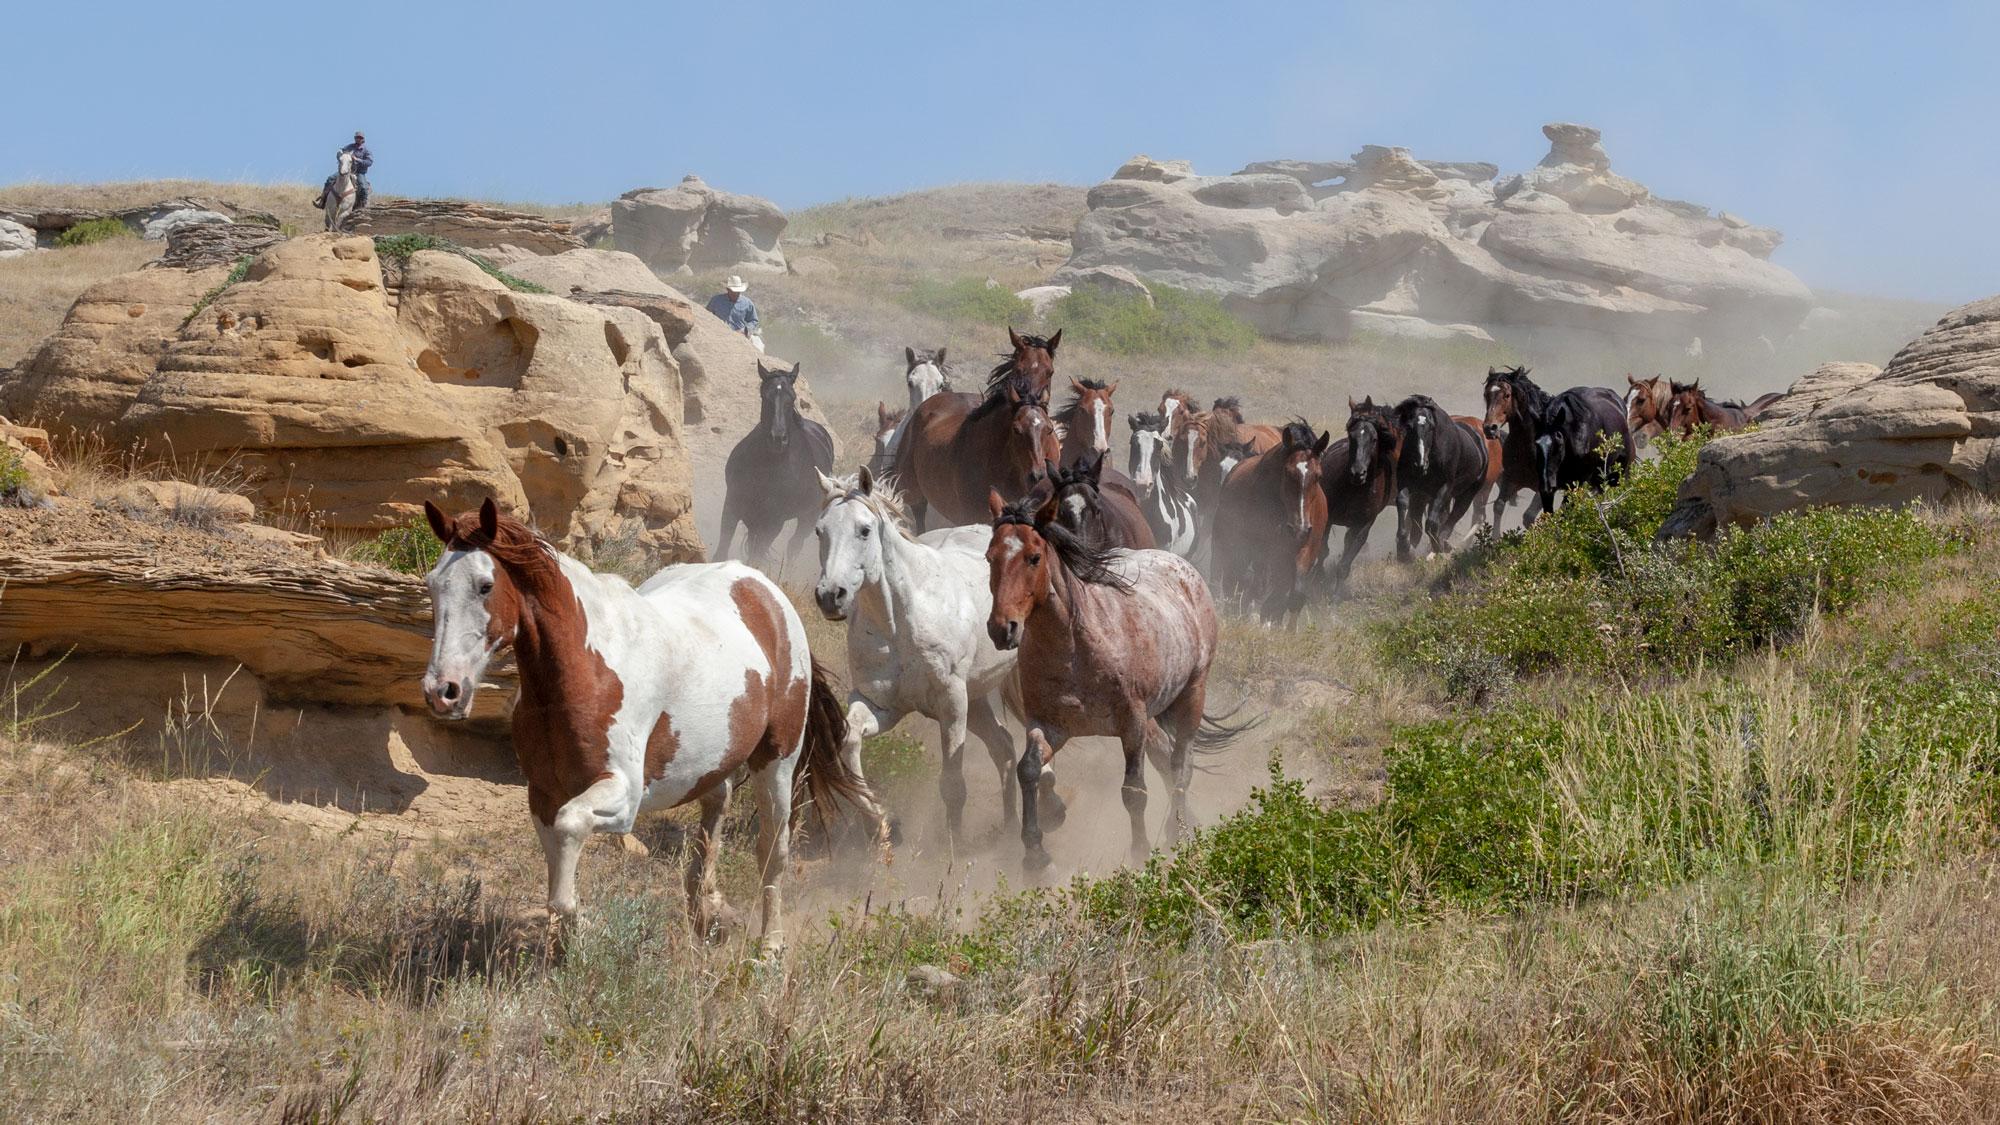 Writing-on-Stone with Horses